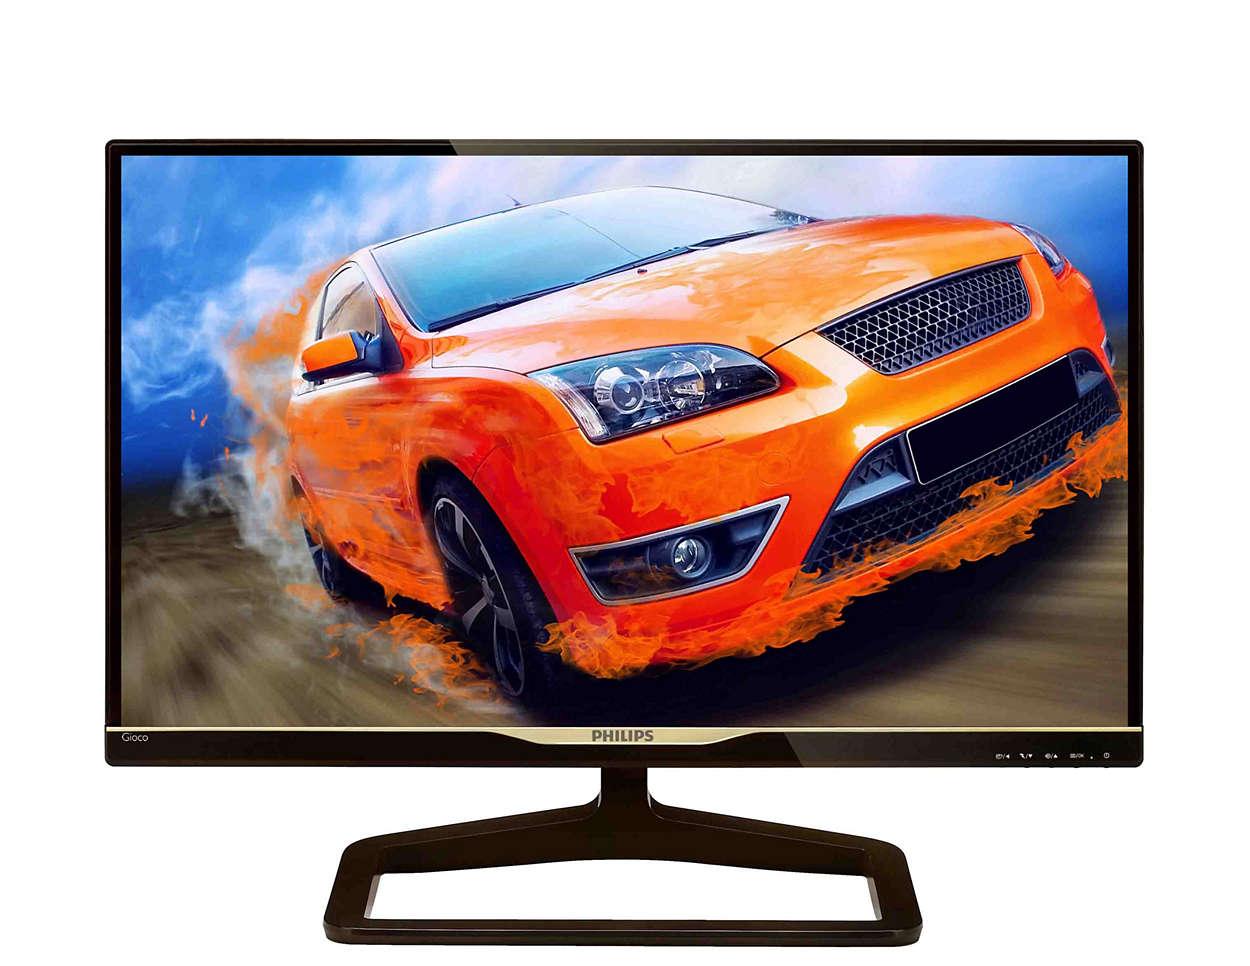 Stylish, high-performance display